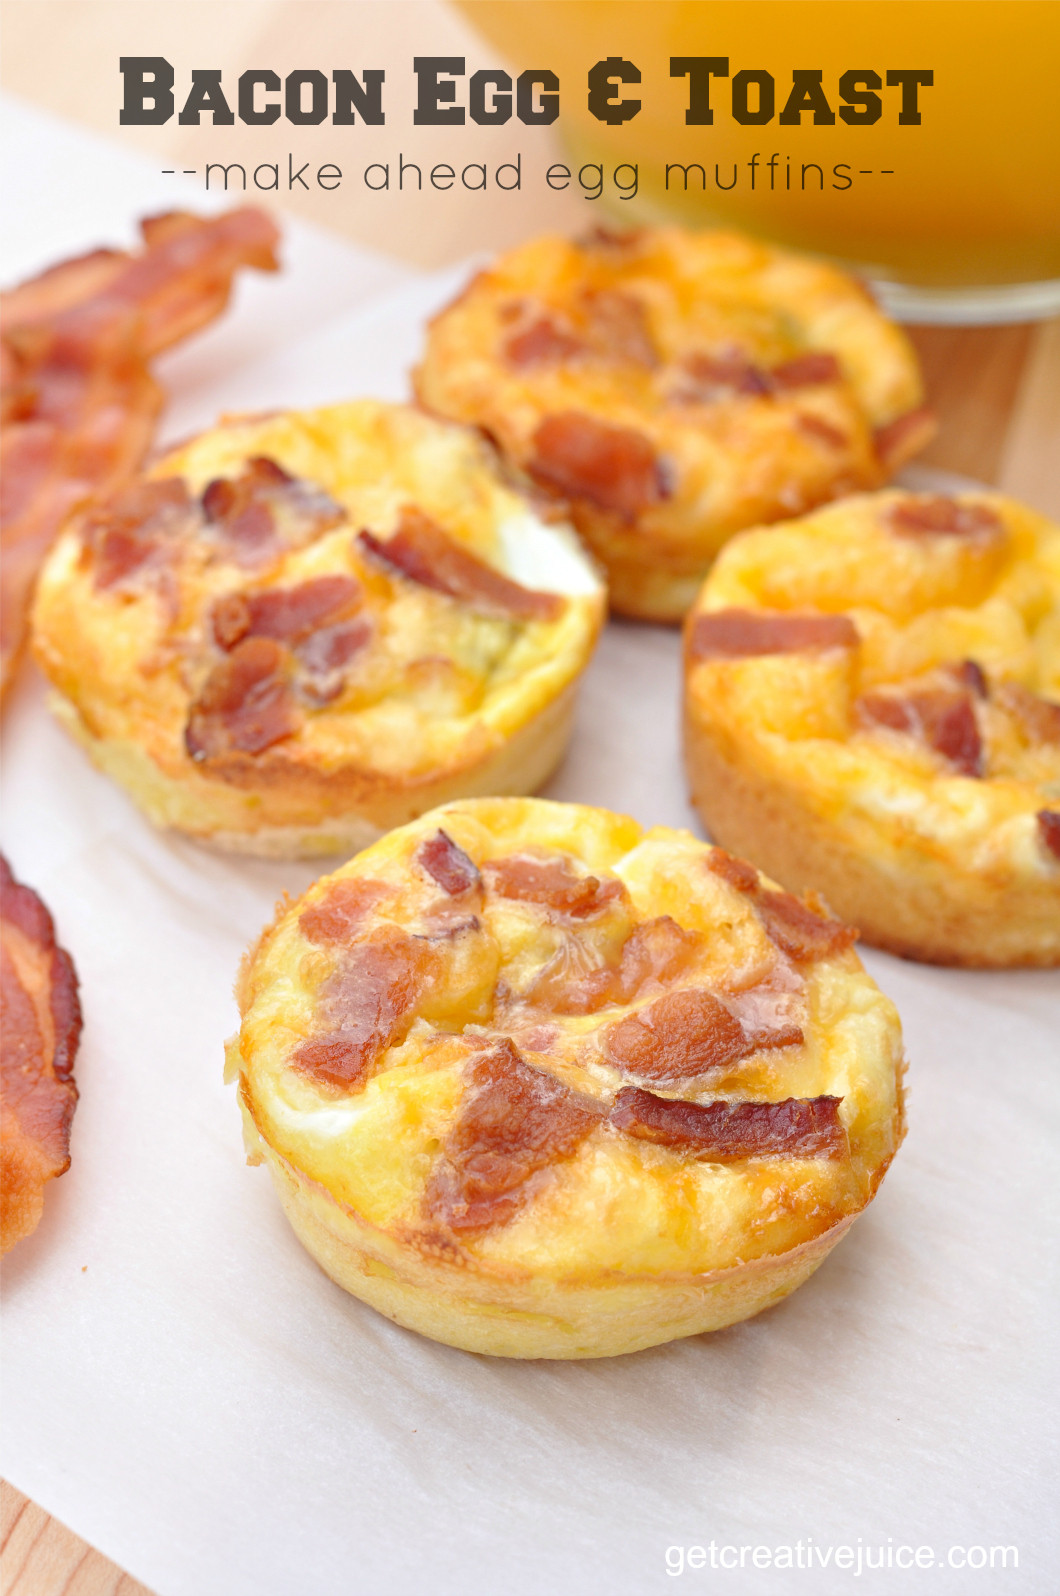 Breakfast Ideas With Eggs And Bacon  Back to school breakfast ideas & recipe